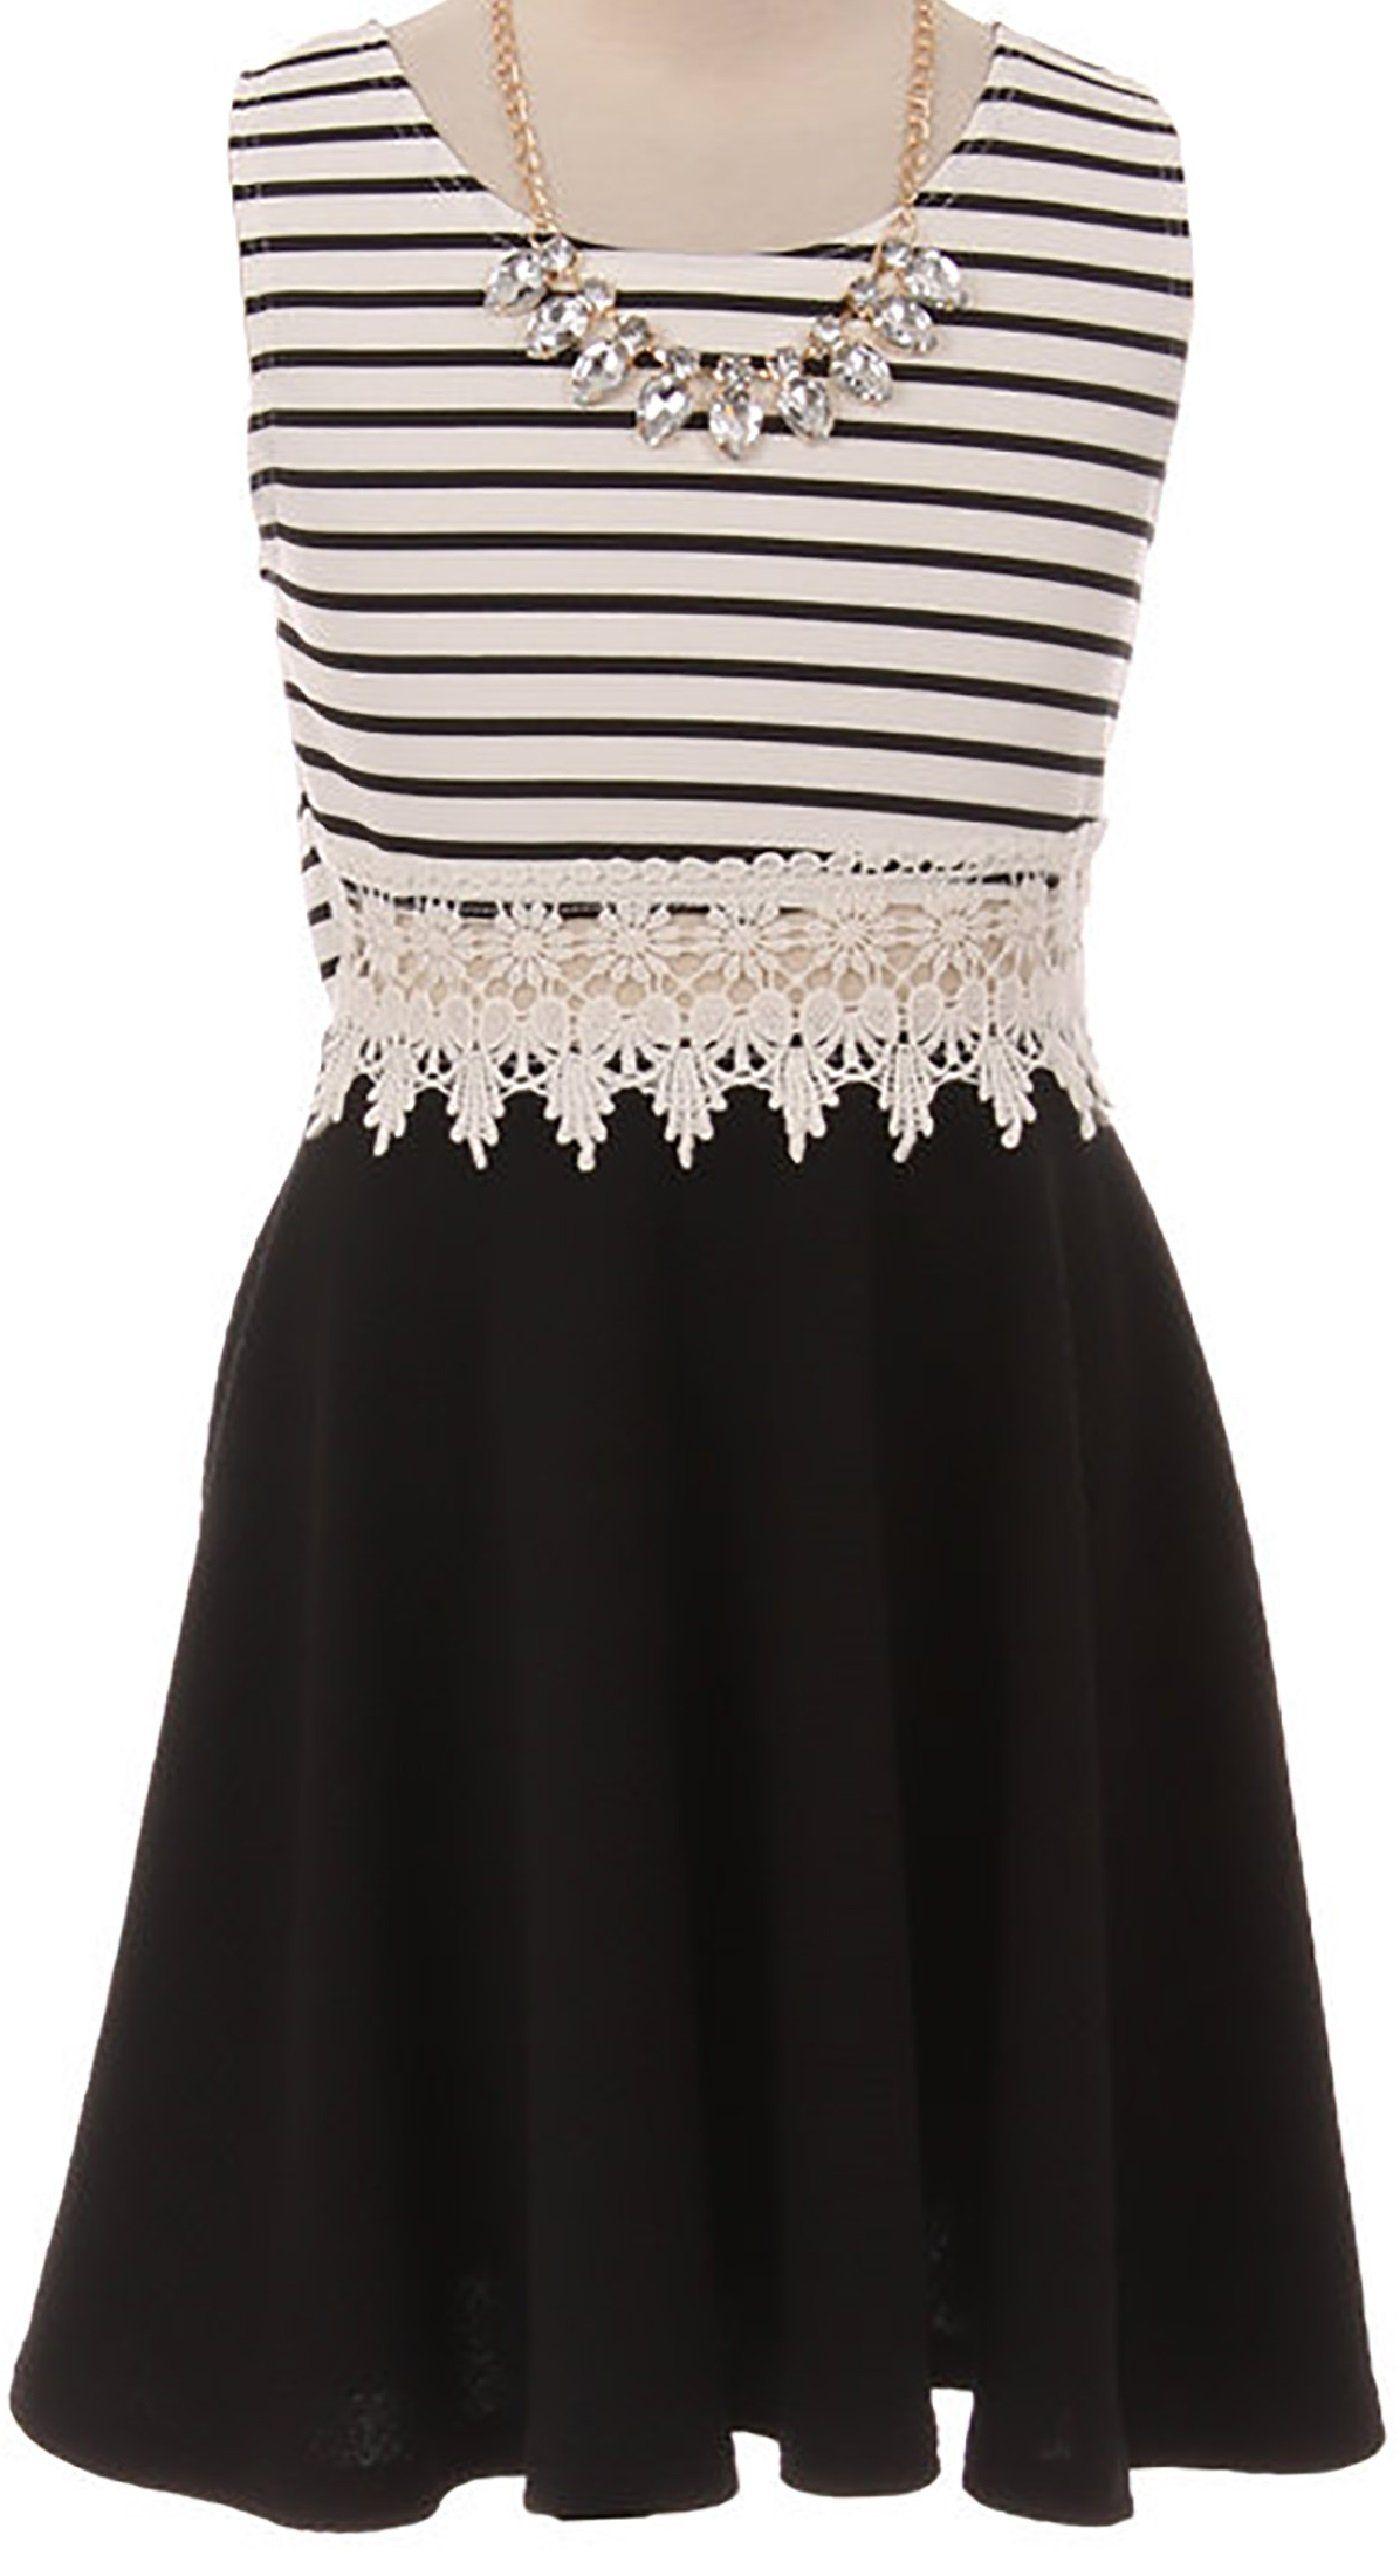 8d8a8b4559e4 Big Girls  Sleeveless Girls Dress Two Tone Stripe Bow Back Summer ...